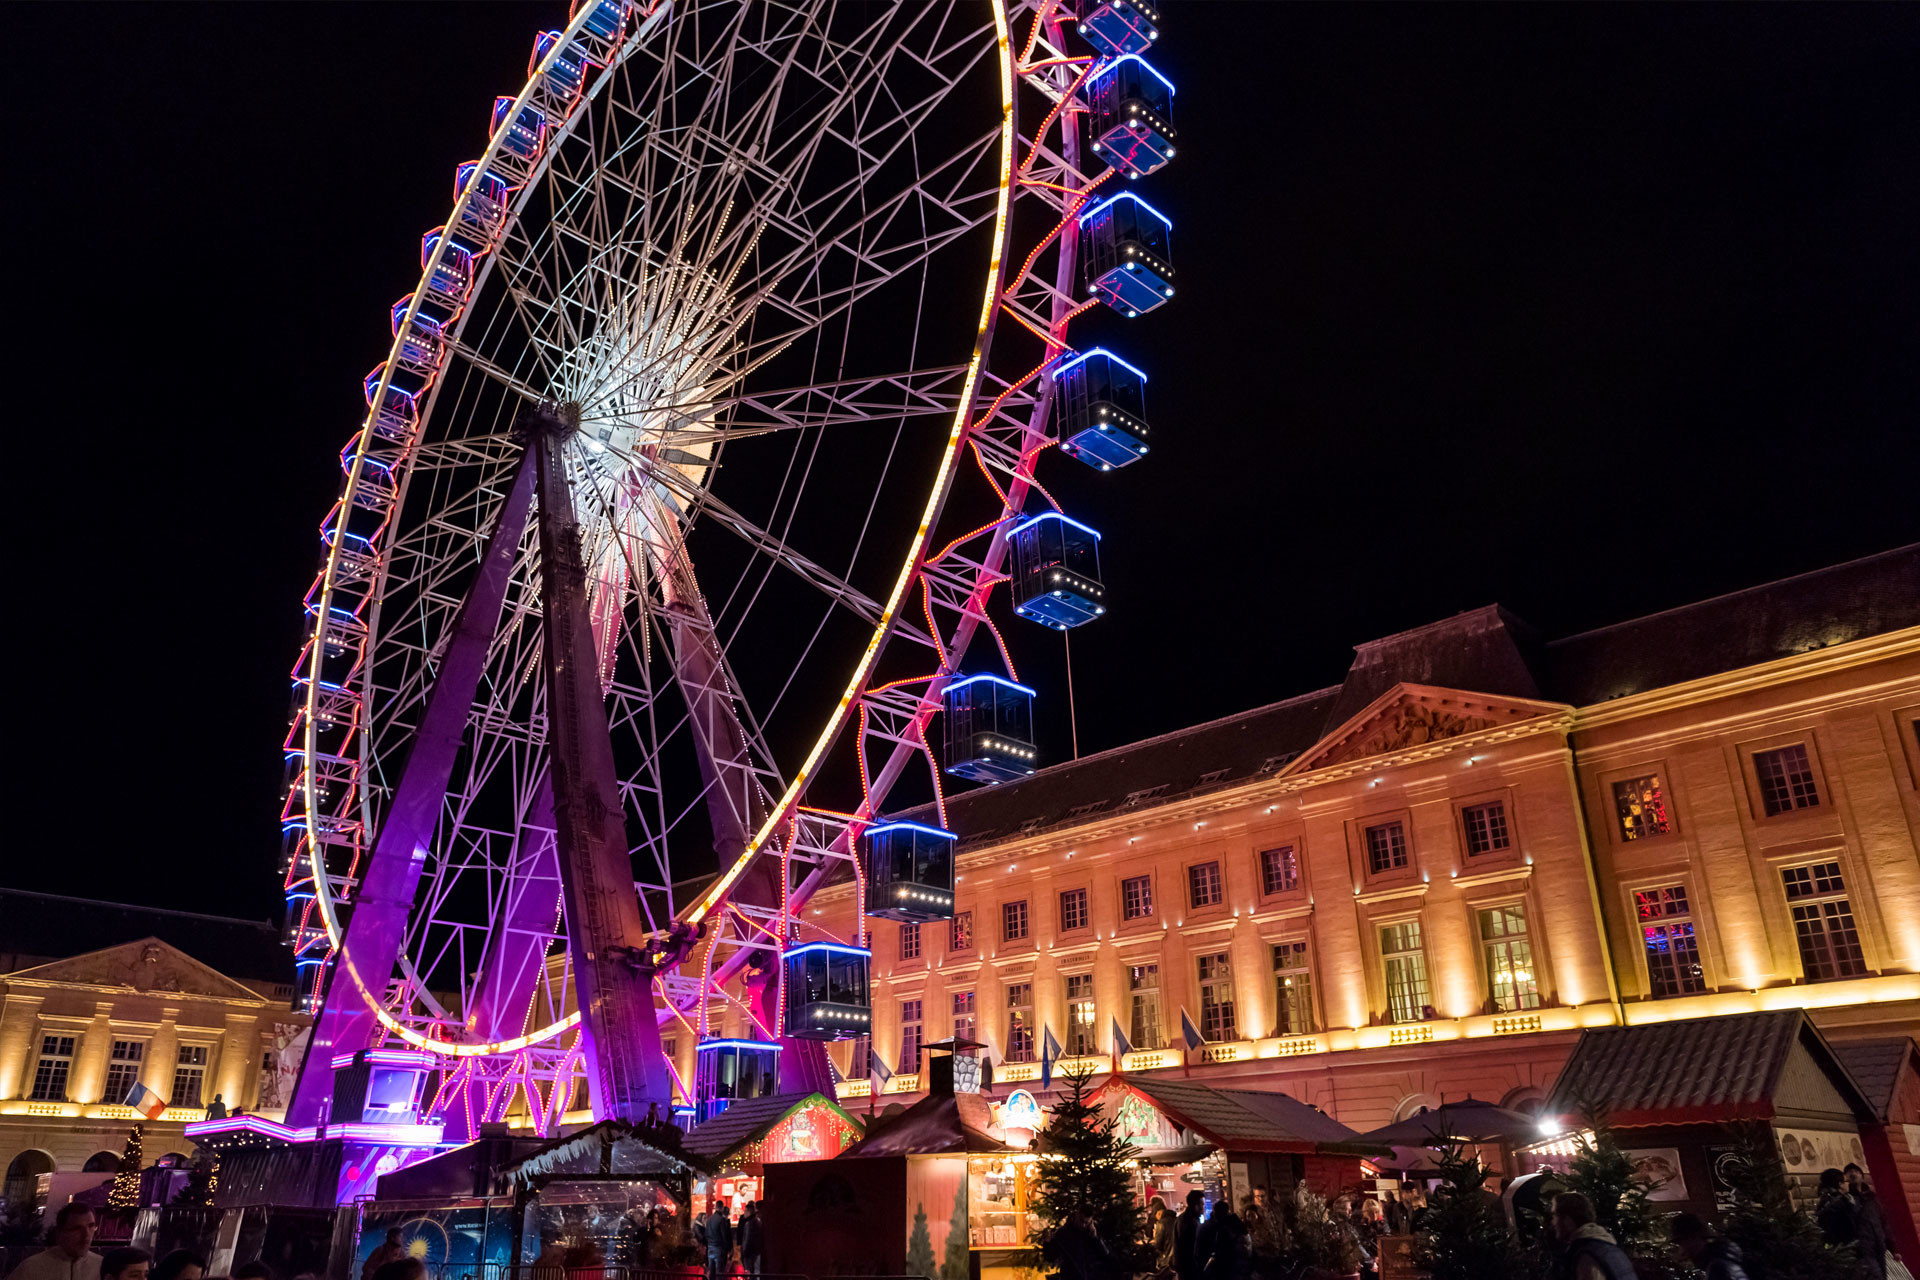 Marche De Noel A Metz Christmas in Metz: our 5 favourites   Lorraine Tourisme